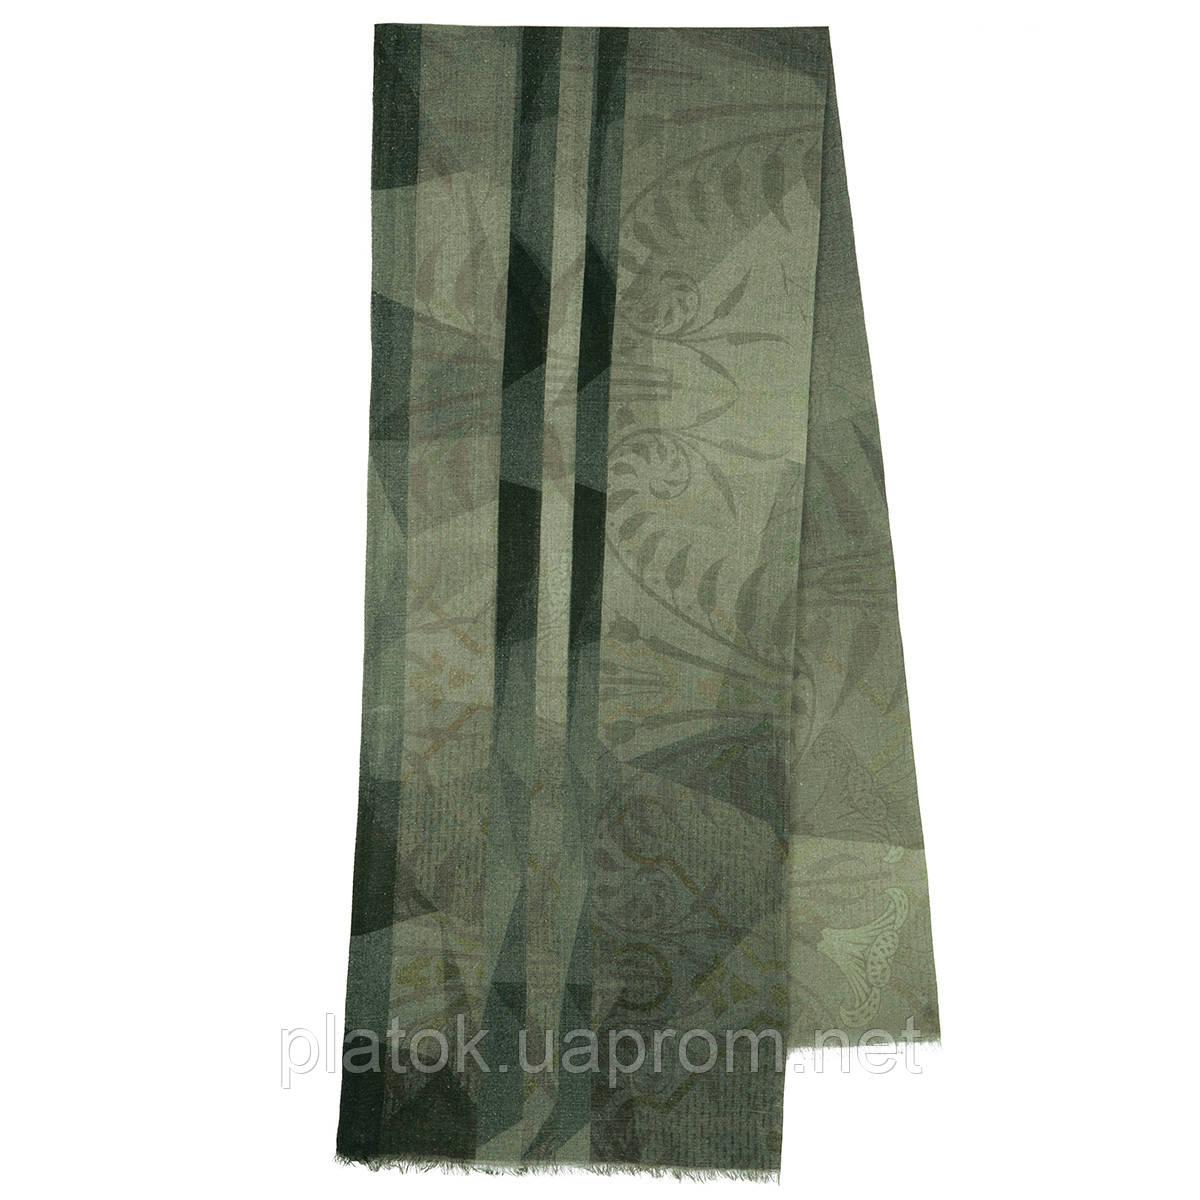 10374-10, павлопосадский шарф (кашне) вовняної (розріджена шерсть) з осыпкой